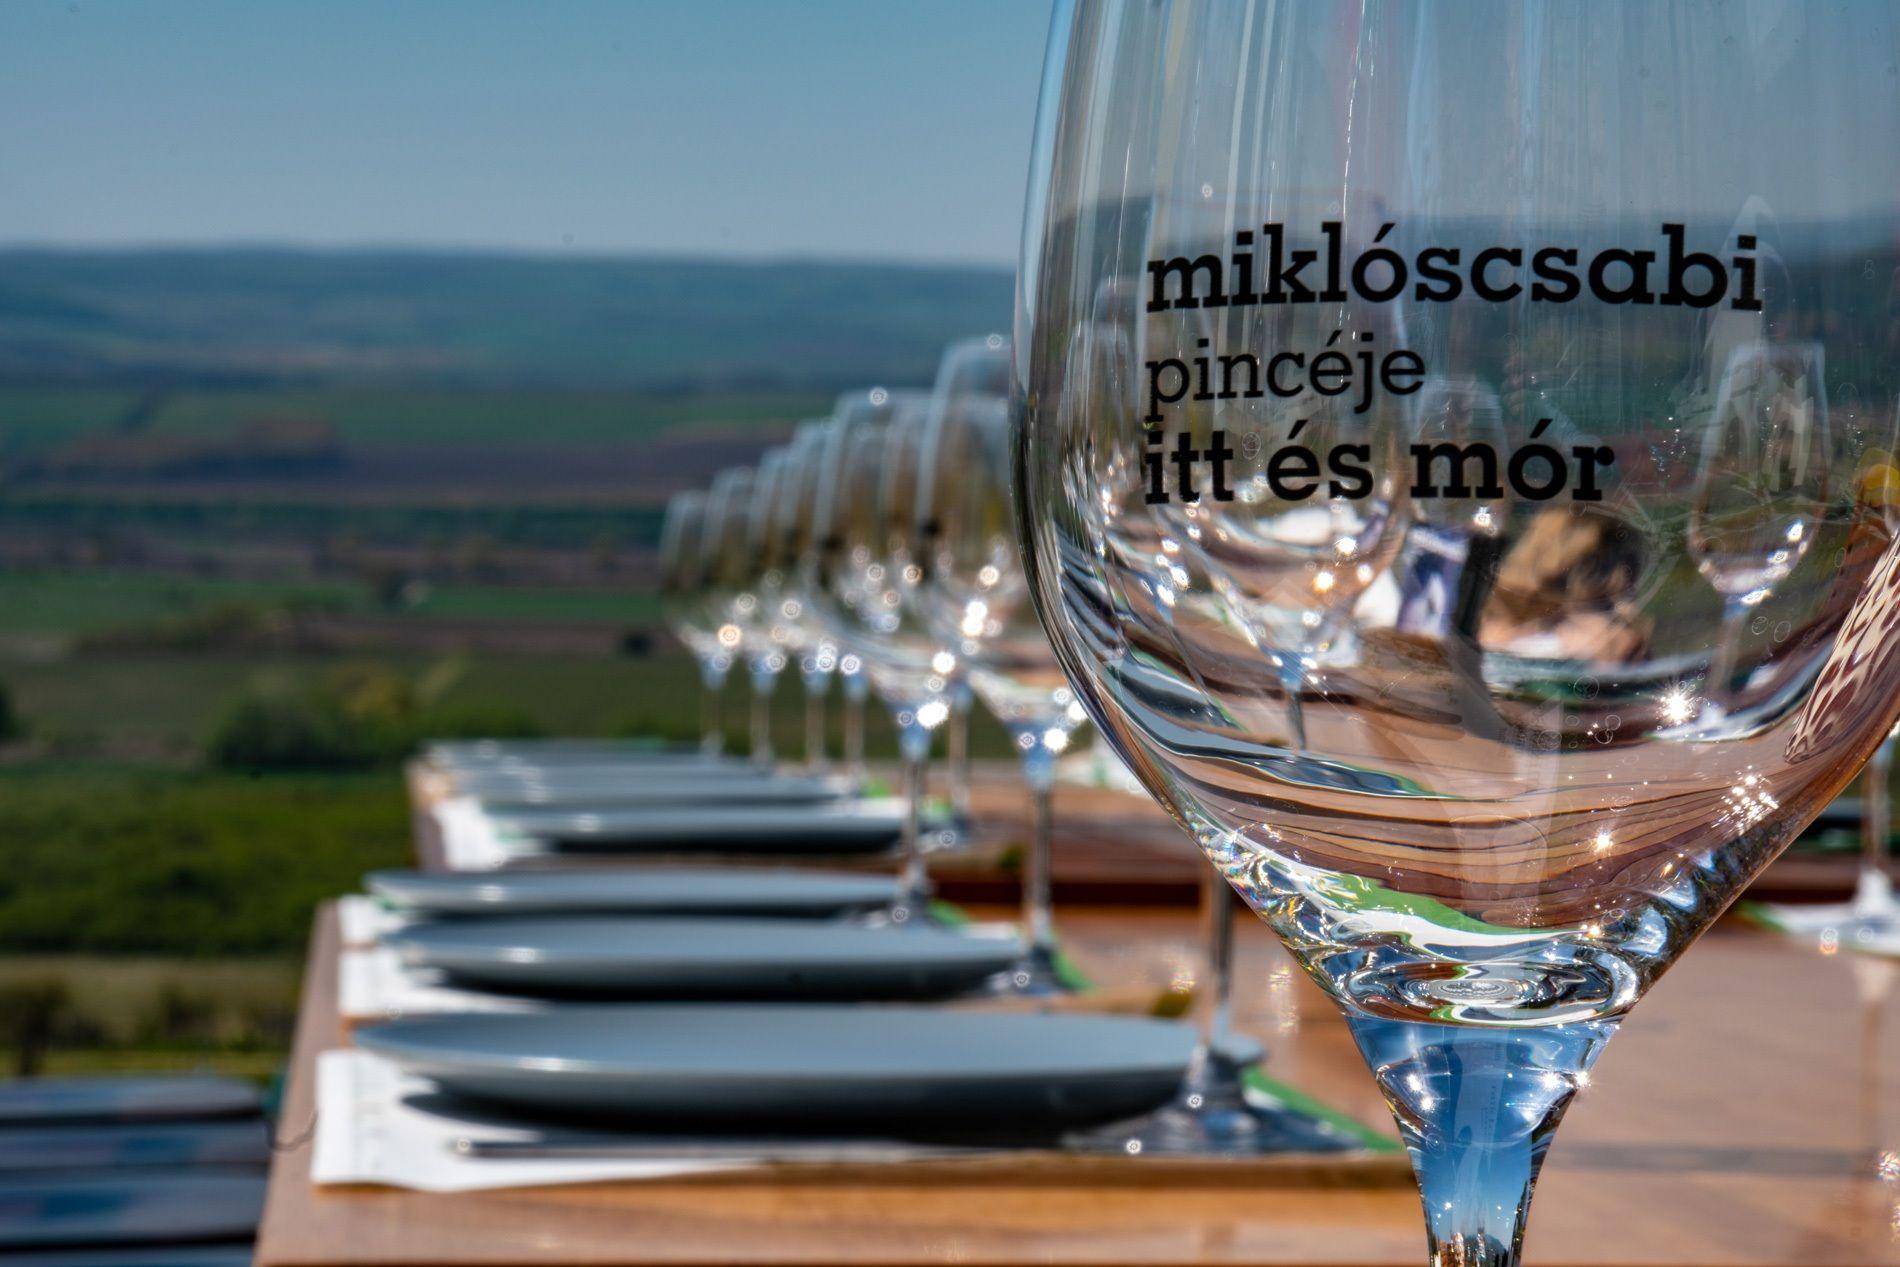 Miklós Csabi - Mór